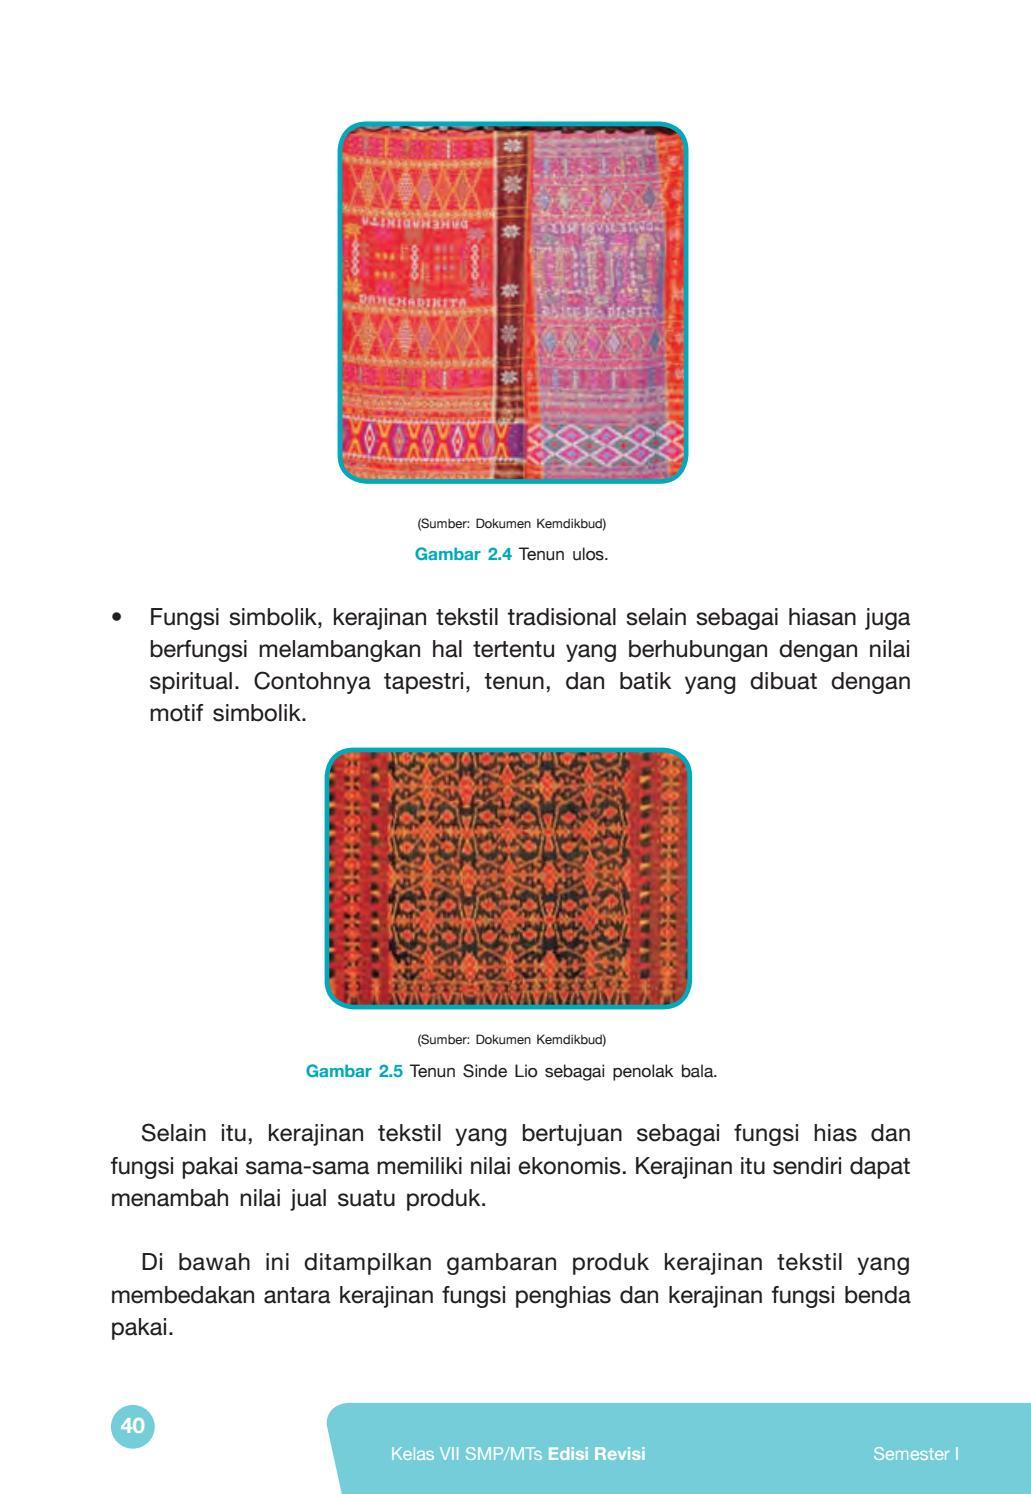 Fungsi Kerajinan Tekstil Tradisional : fungsi, kerajinan, tekstil, tradisional, Kelas, Prakarya, Siswa, Issuu